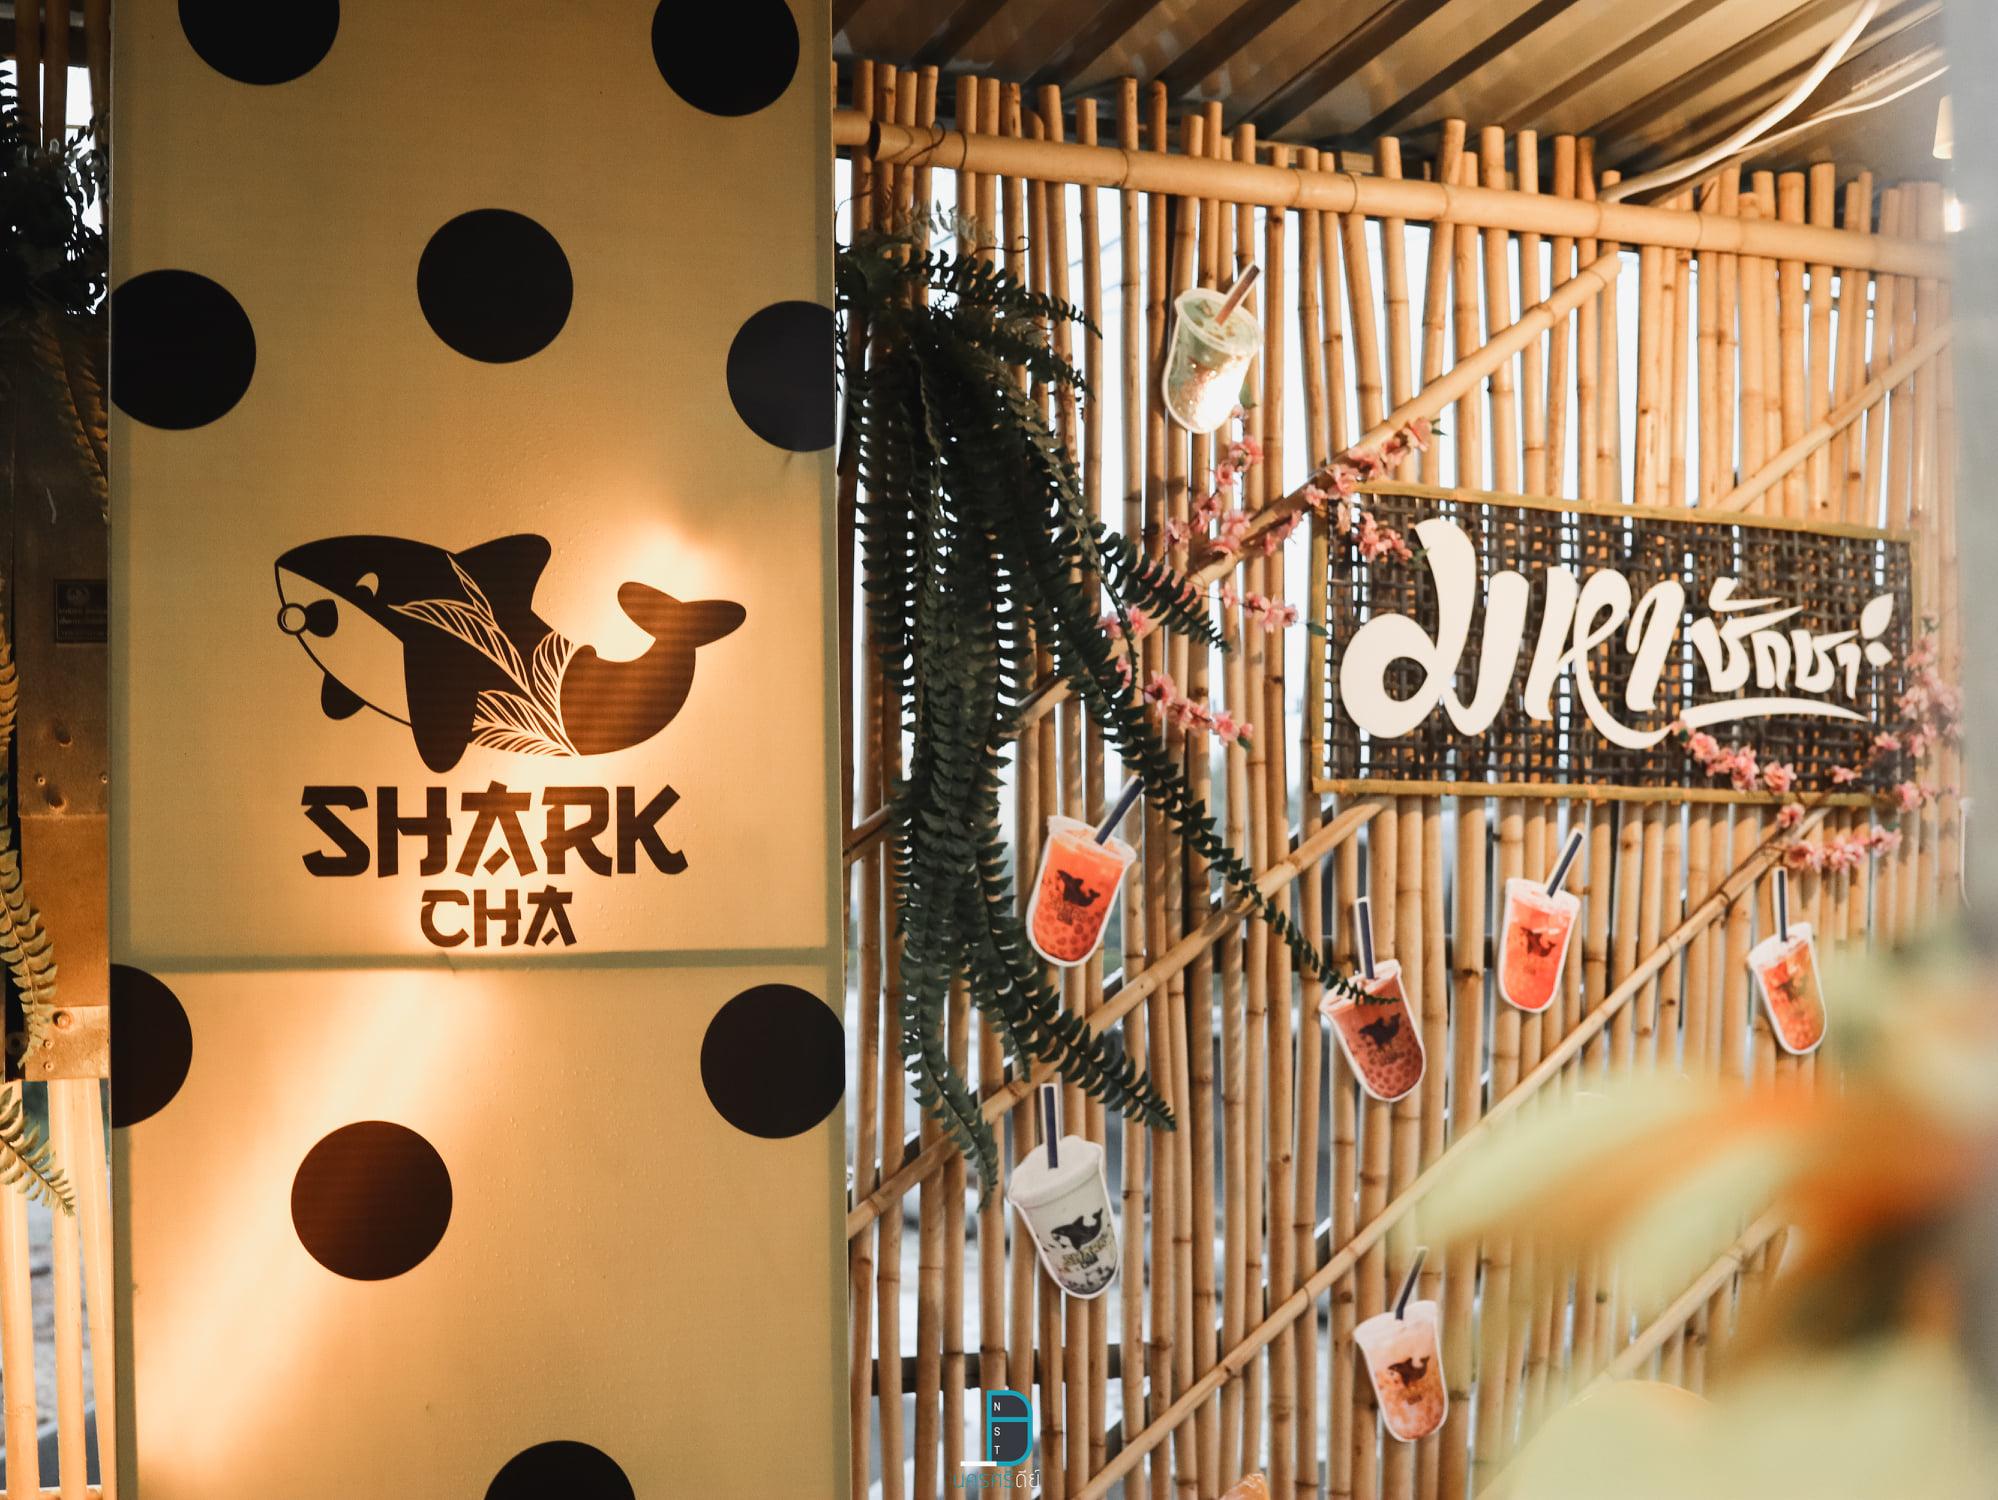 Shark Cha นครศรีธรรมราช ร้านชาไข่มุกตักเองแก้วใหญ่แบบจุกๆ นครศรีดีย์